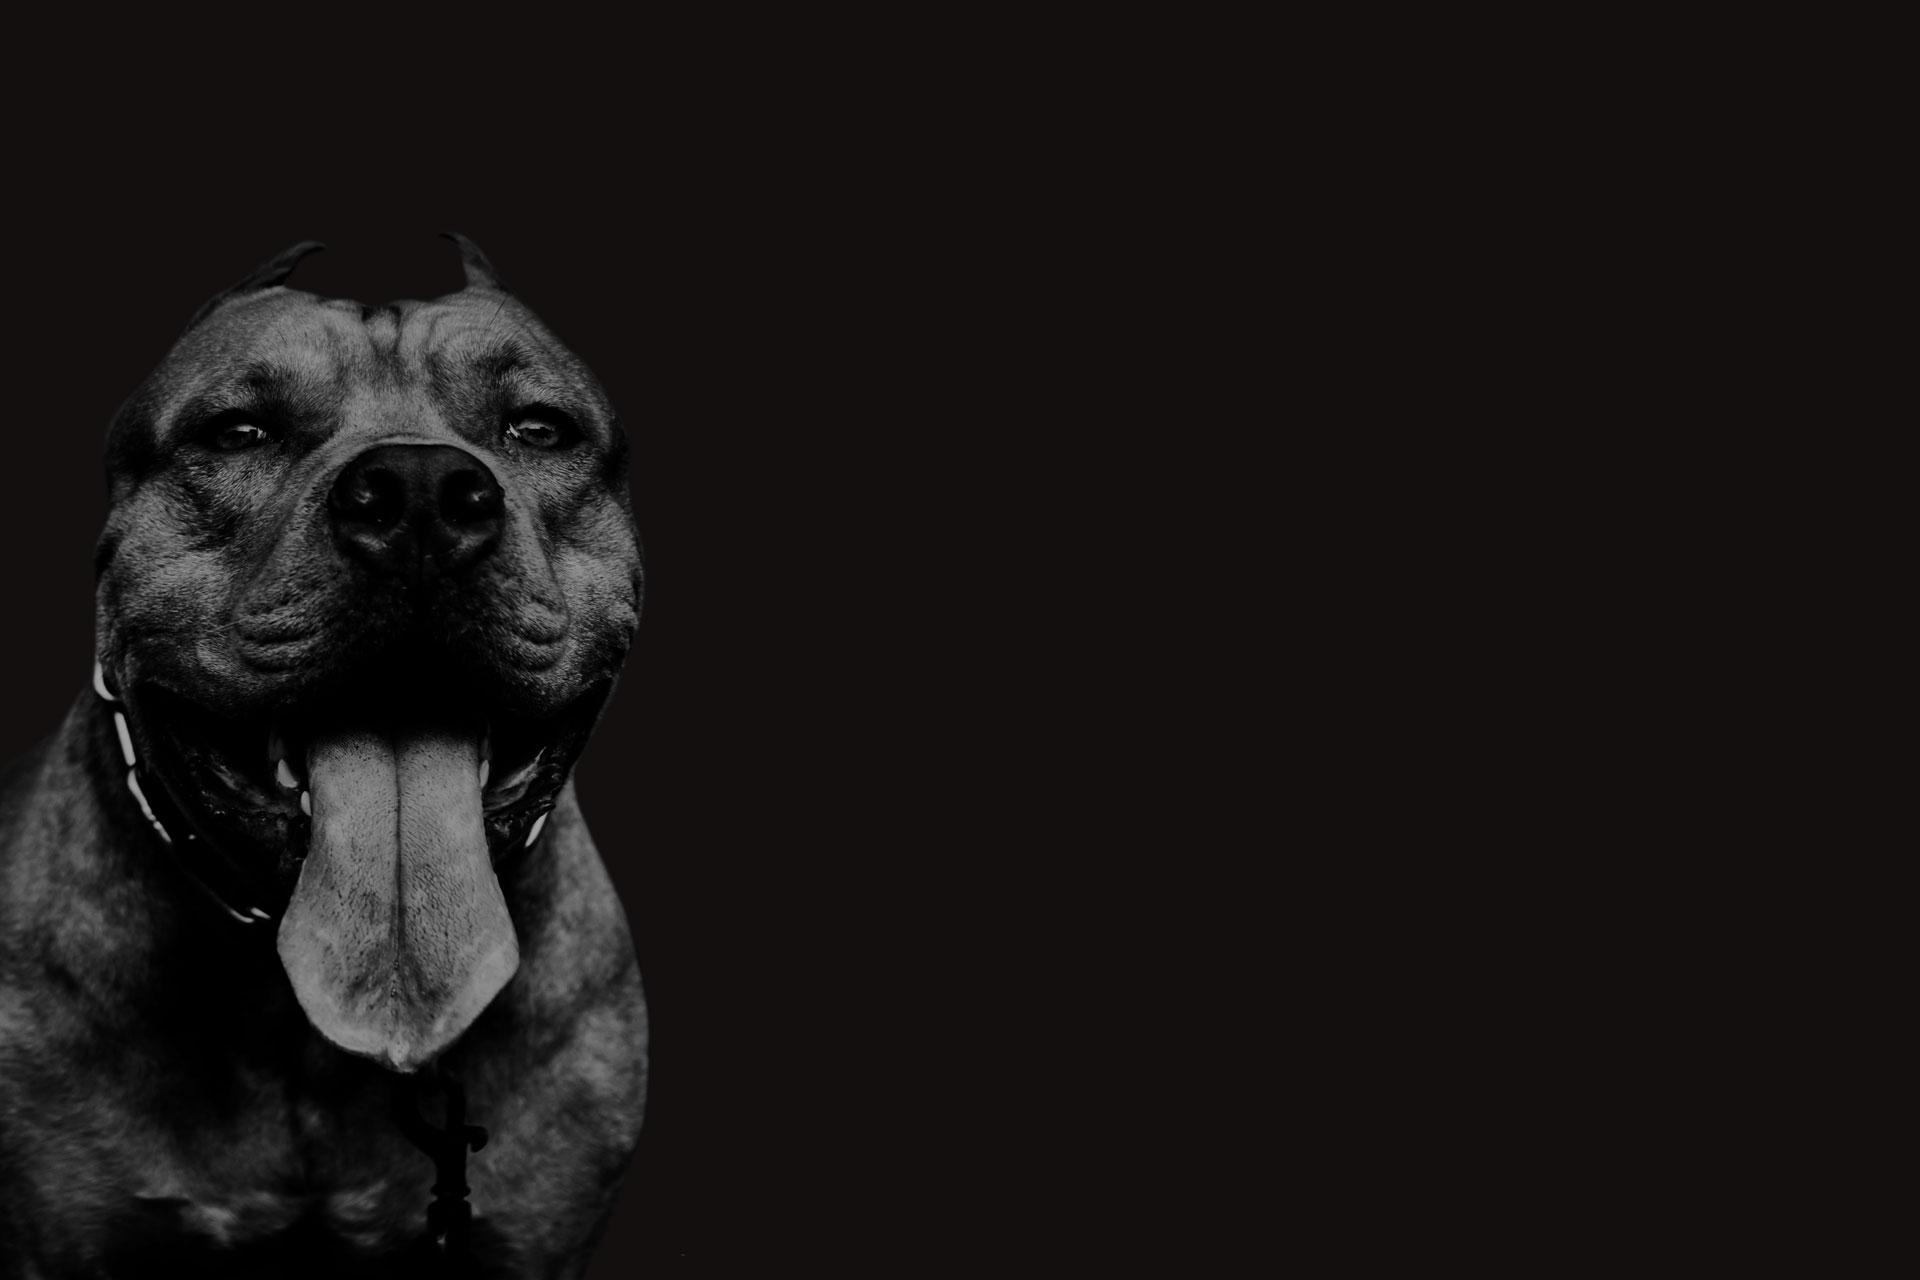 Pit Bull Dog Black and White